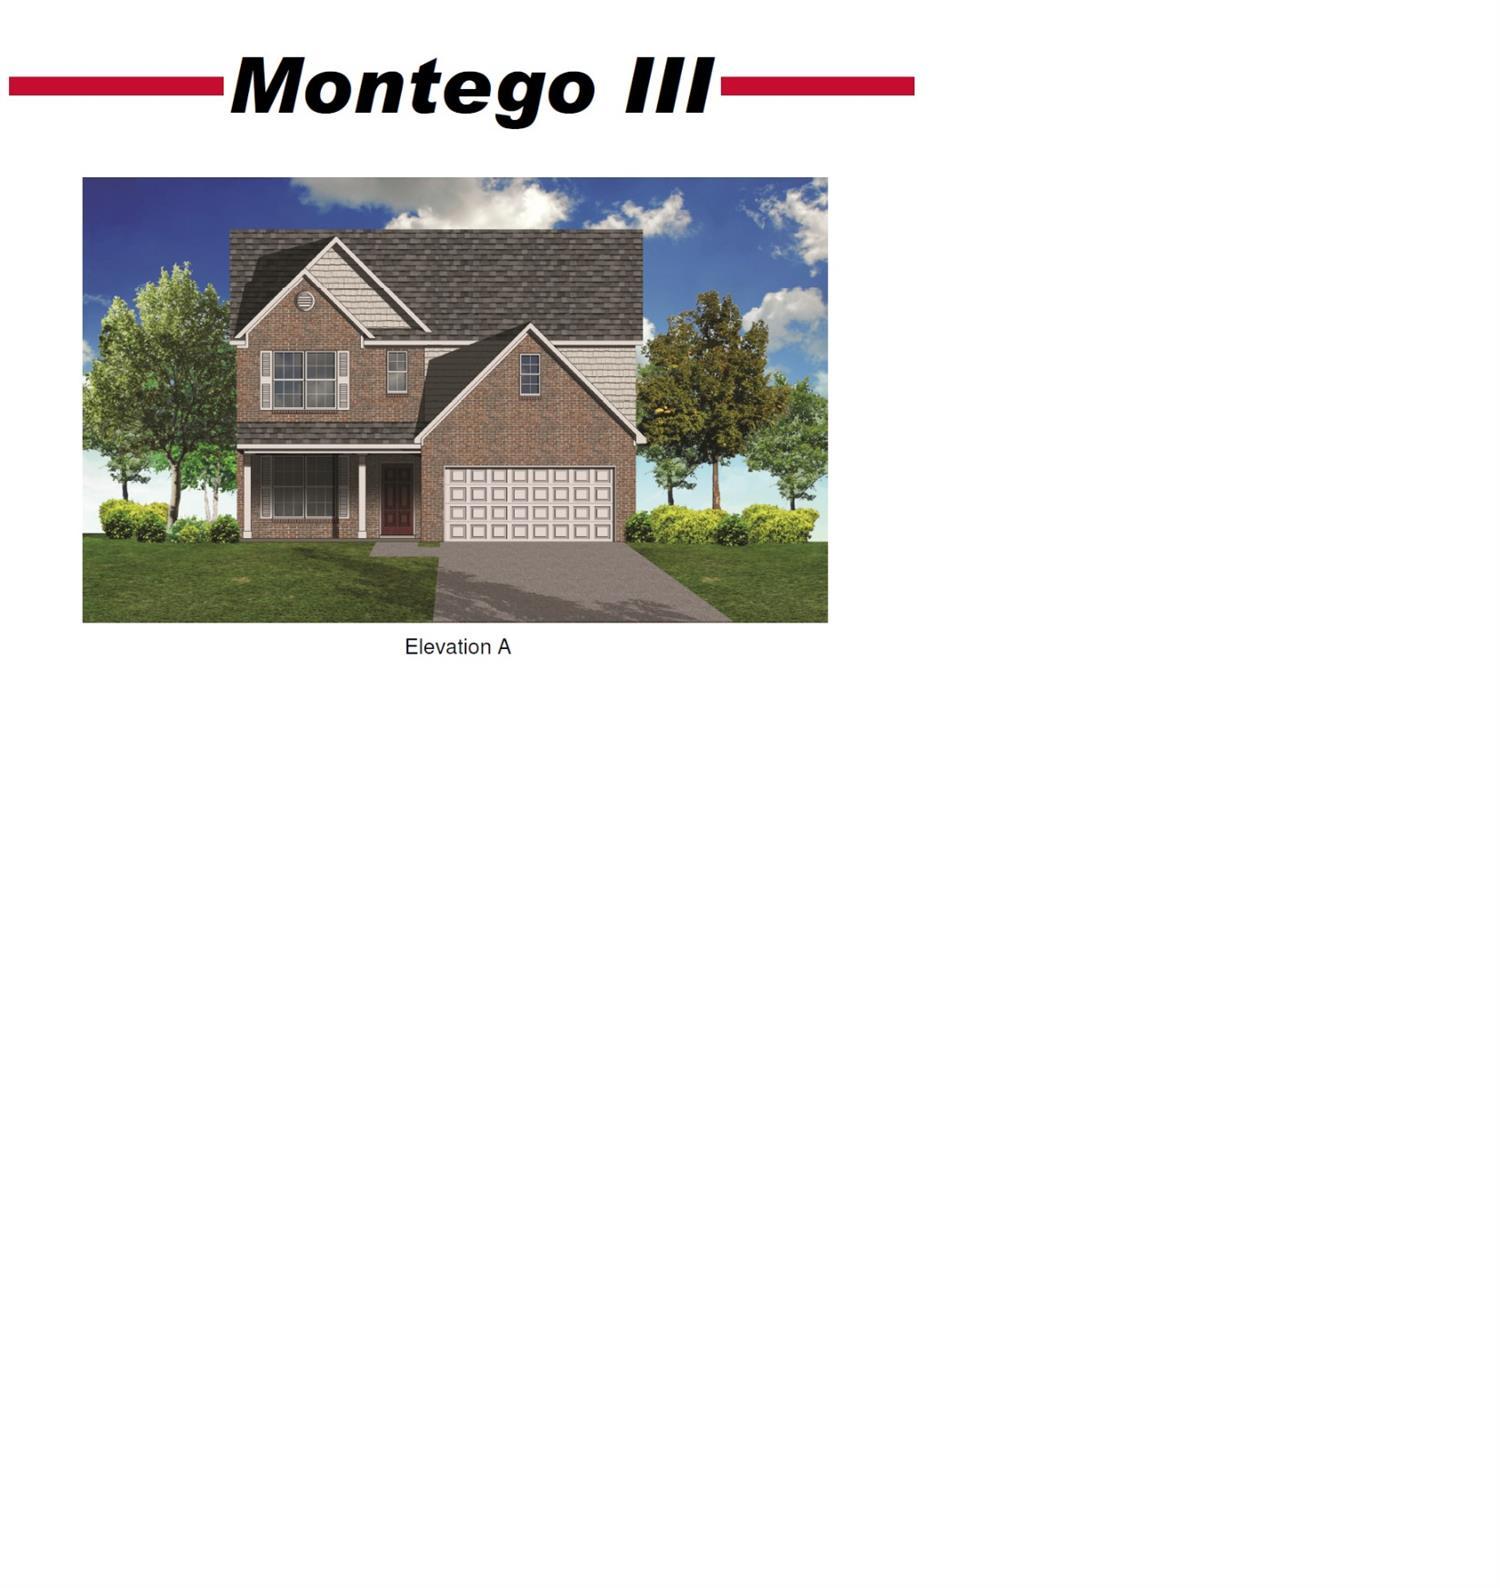 3262 Tranquility Point, Lexington, KY 40509